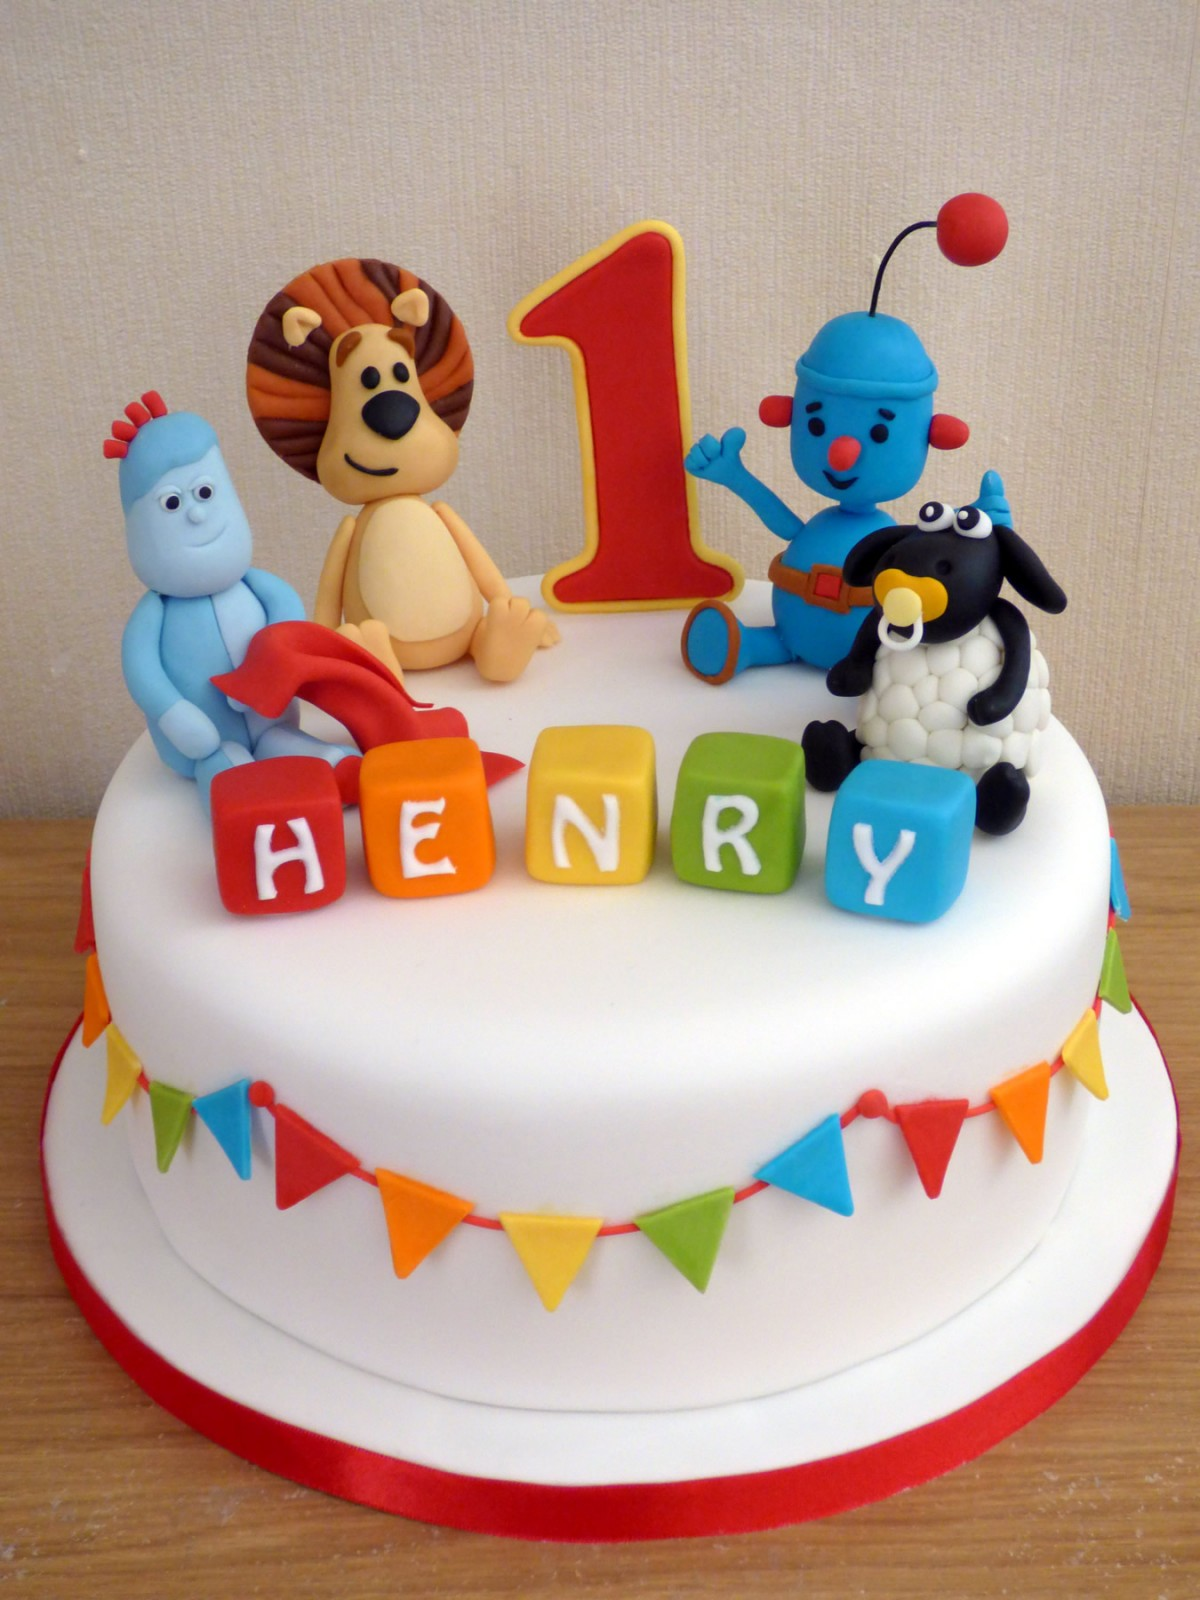 Toys For A 1st Birthday : Favourite toys st birthday cake « susie s cakes